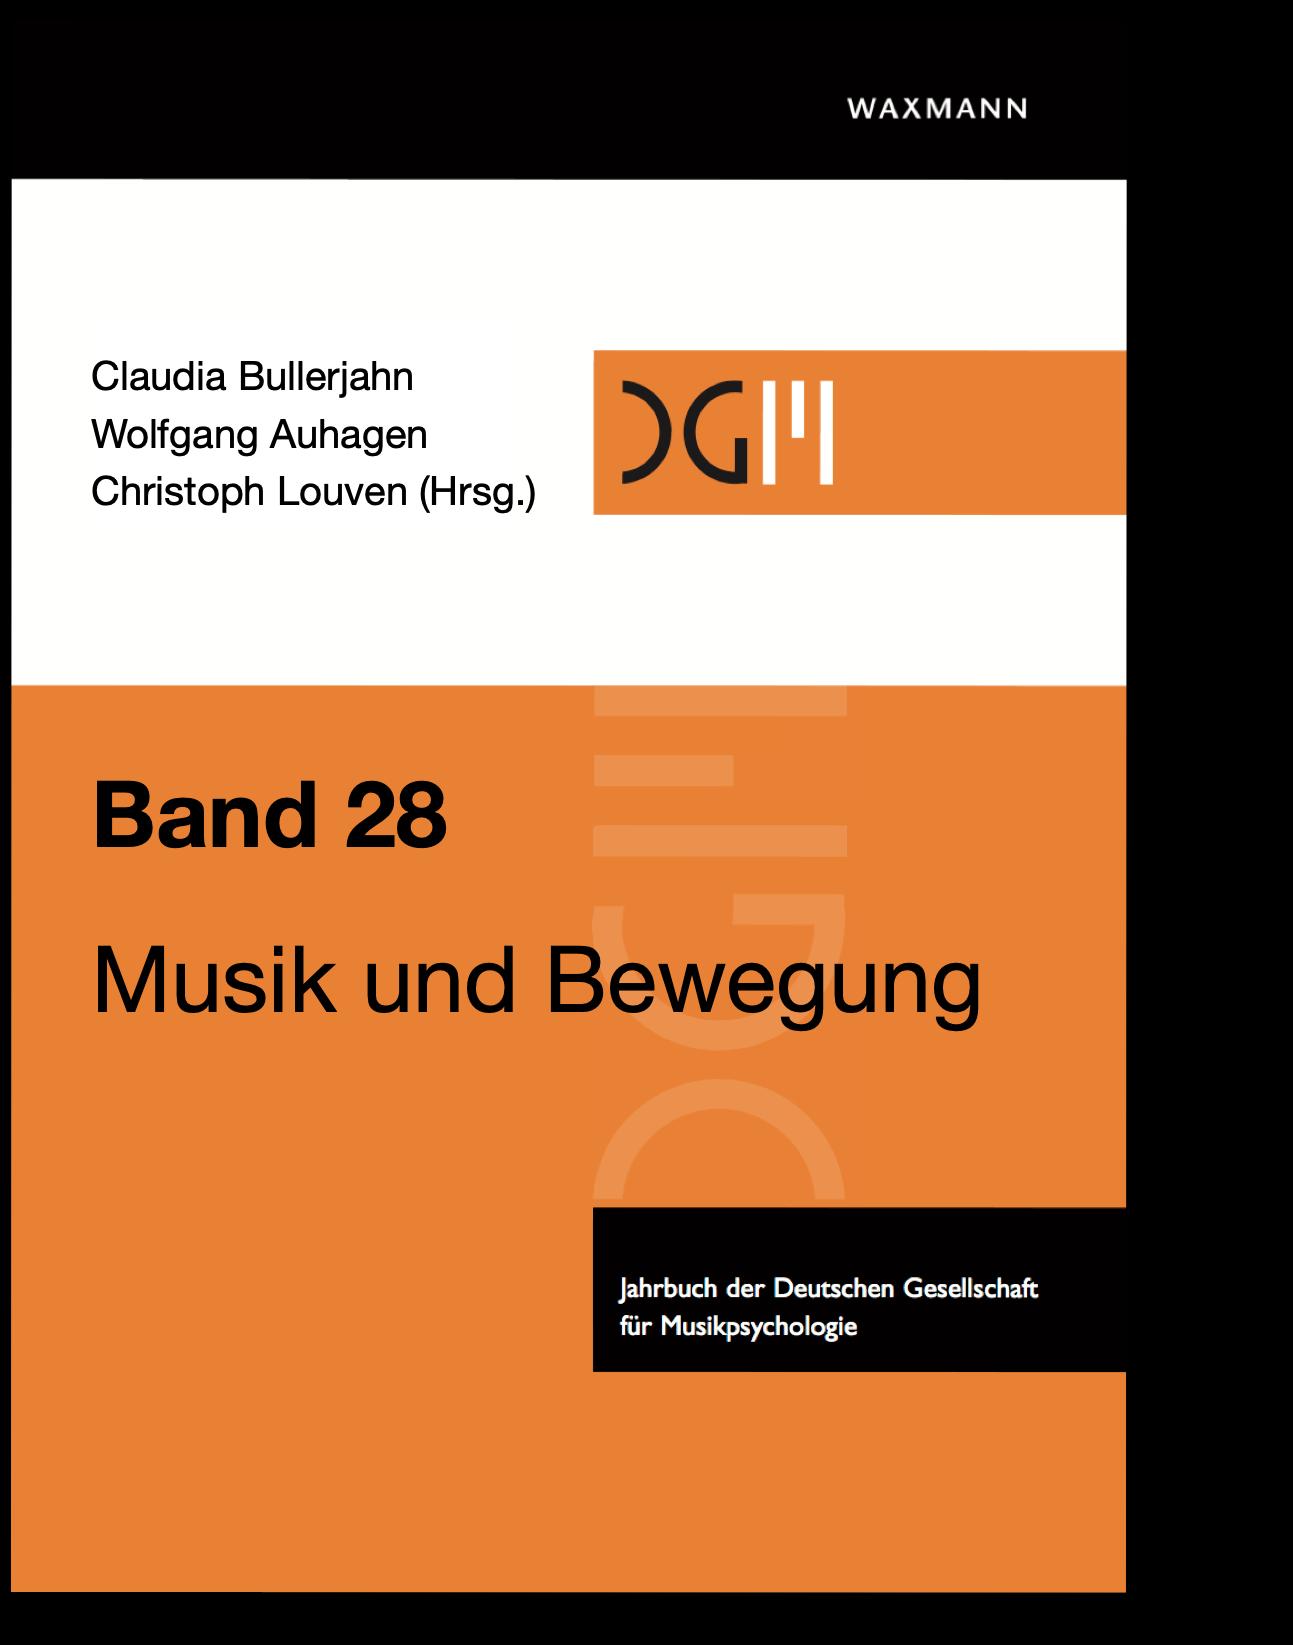 Cover von Band 28 des Jahrbuchs DGM